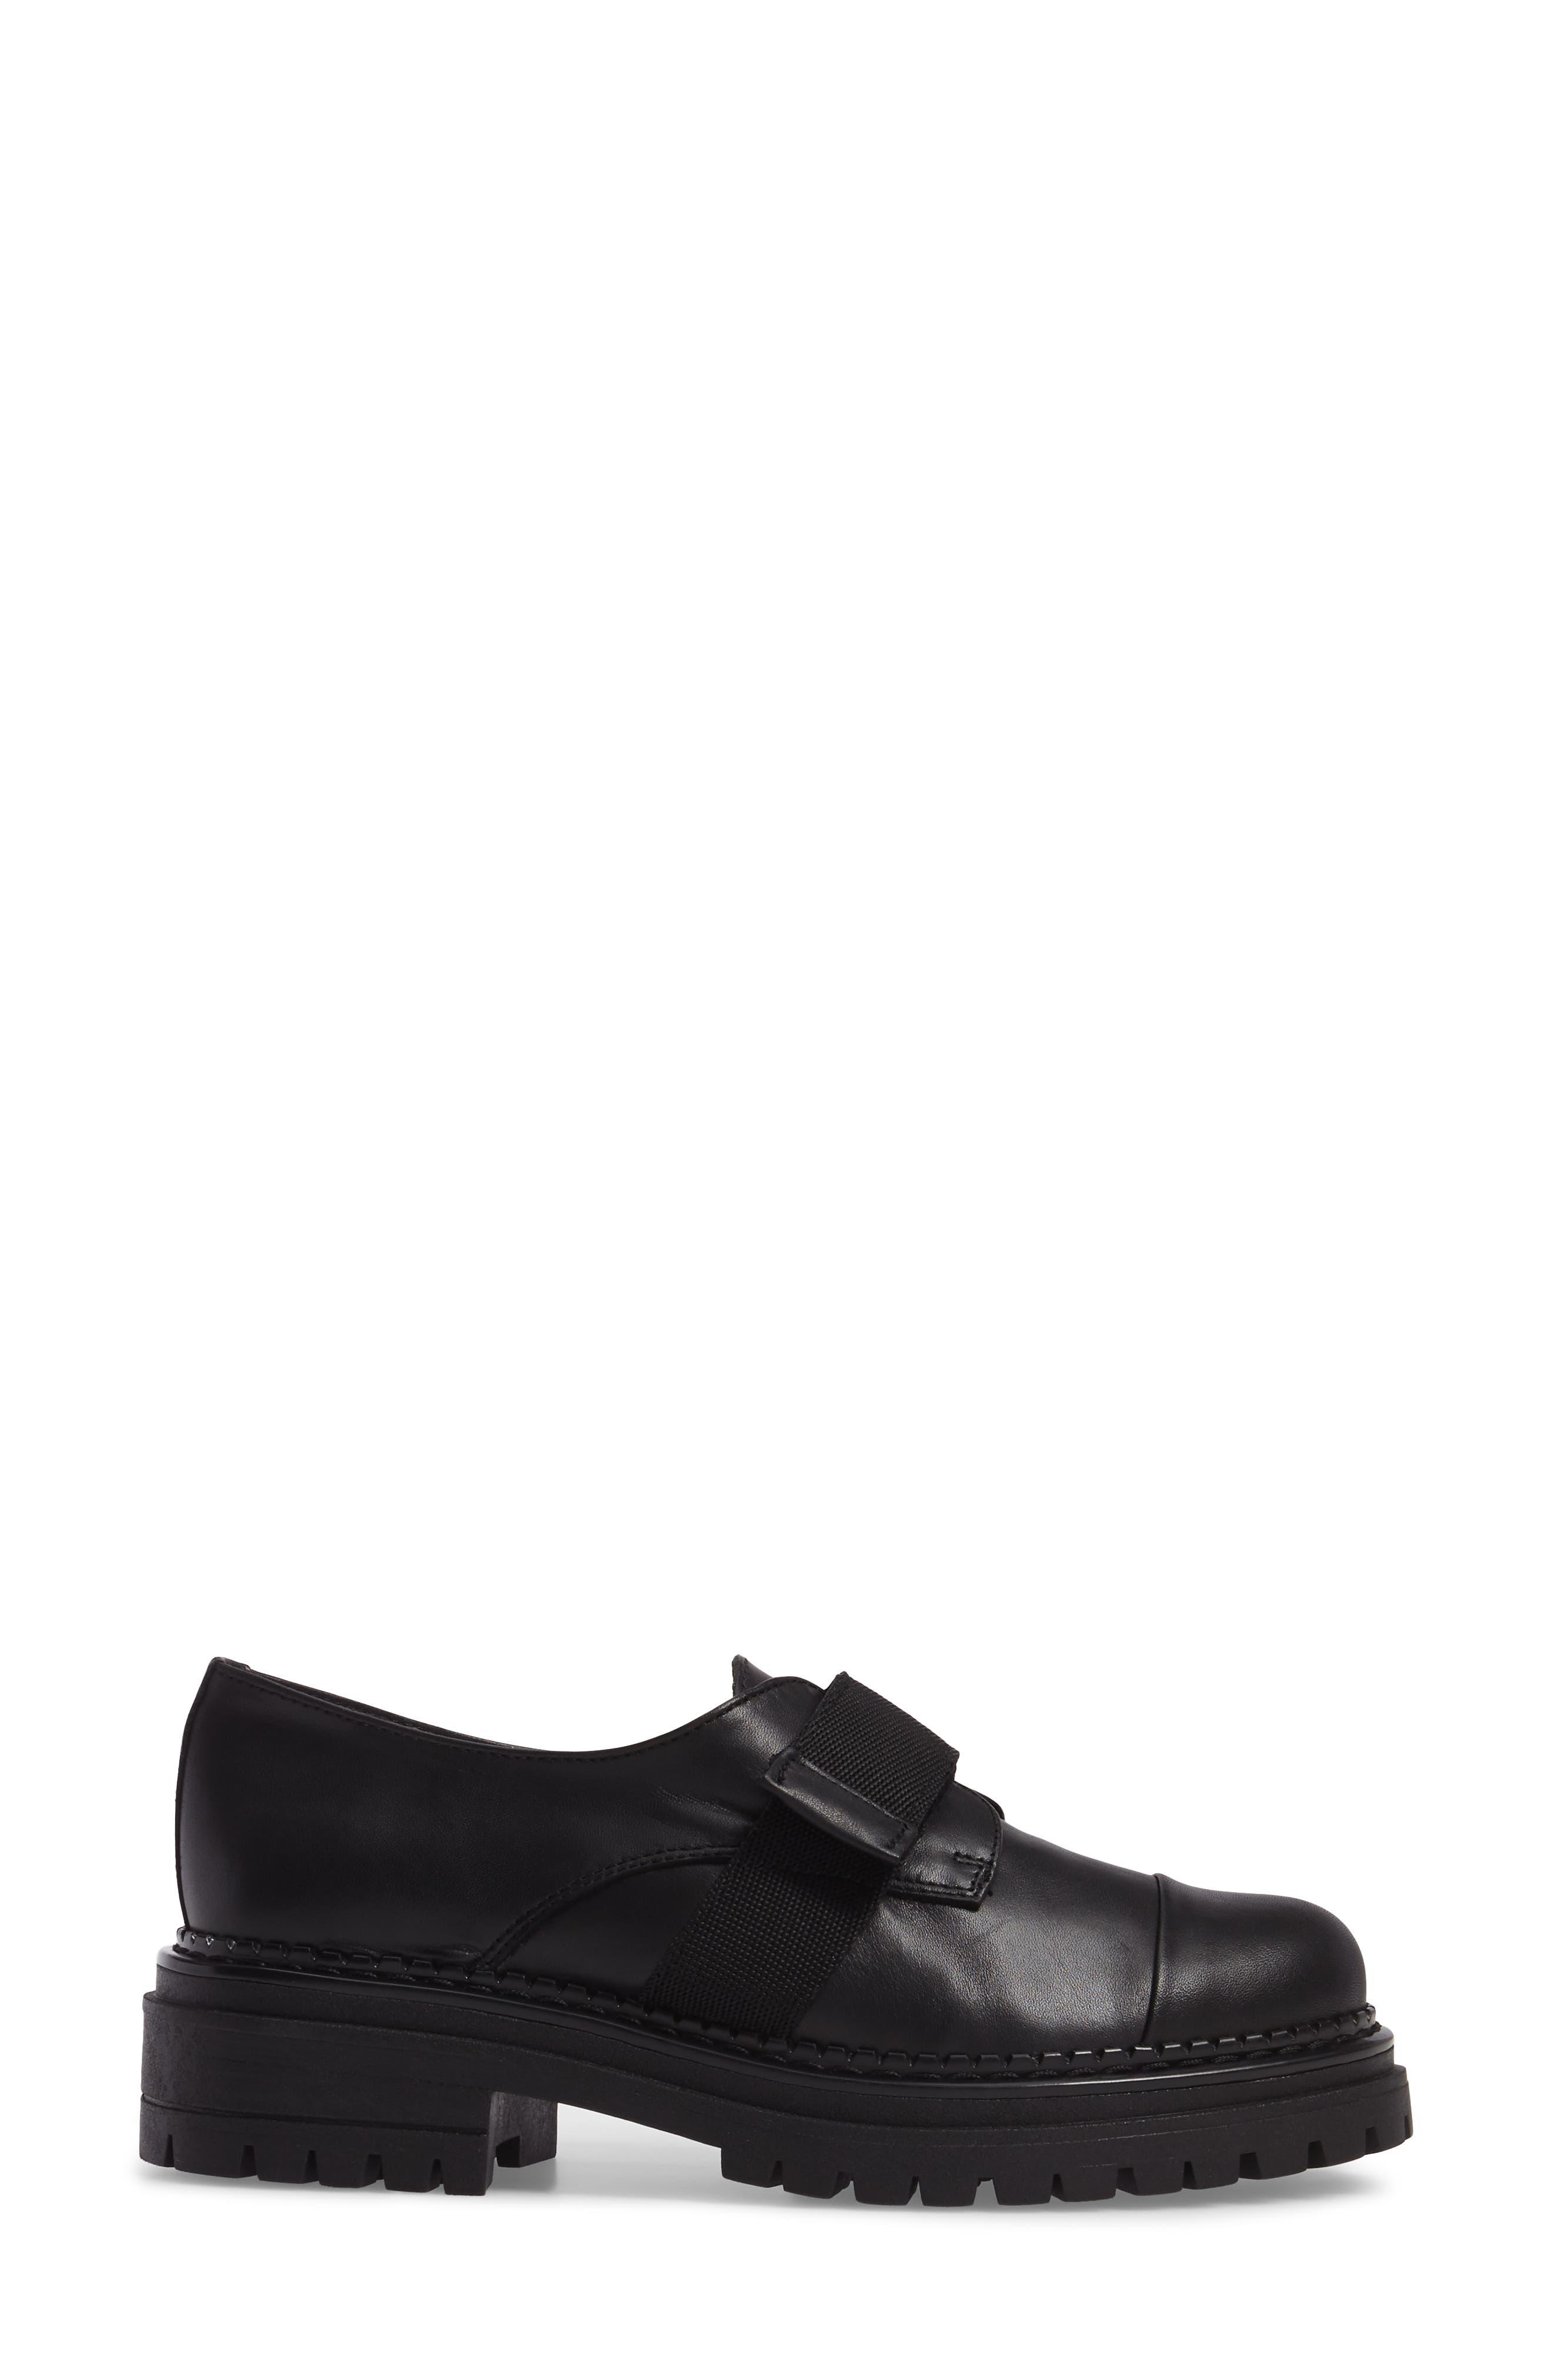 Keeper Lug Sole Loafer,                             Alternate thumbnail 3, color,                             Black